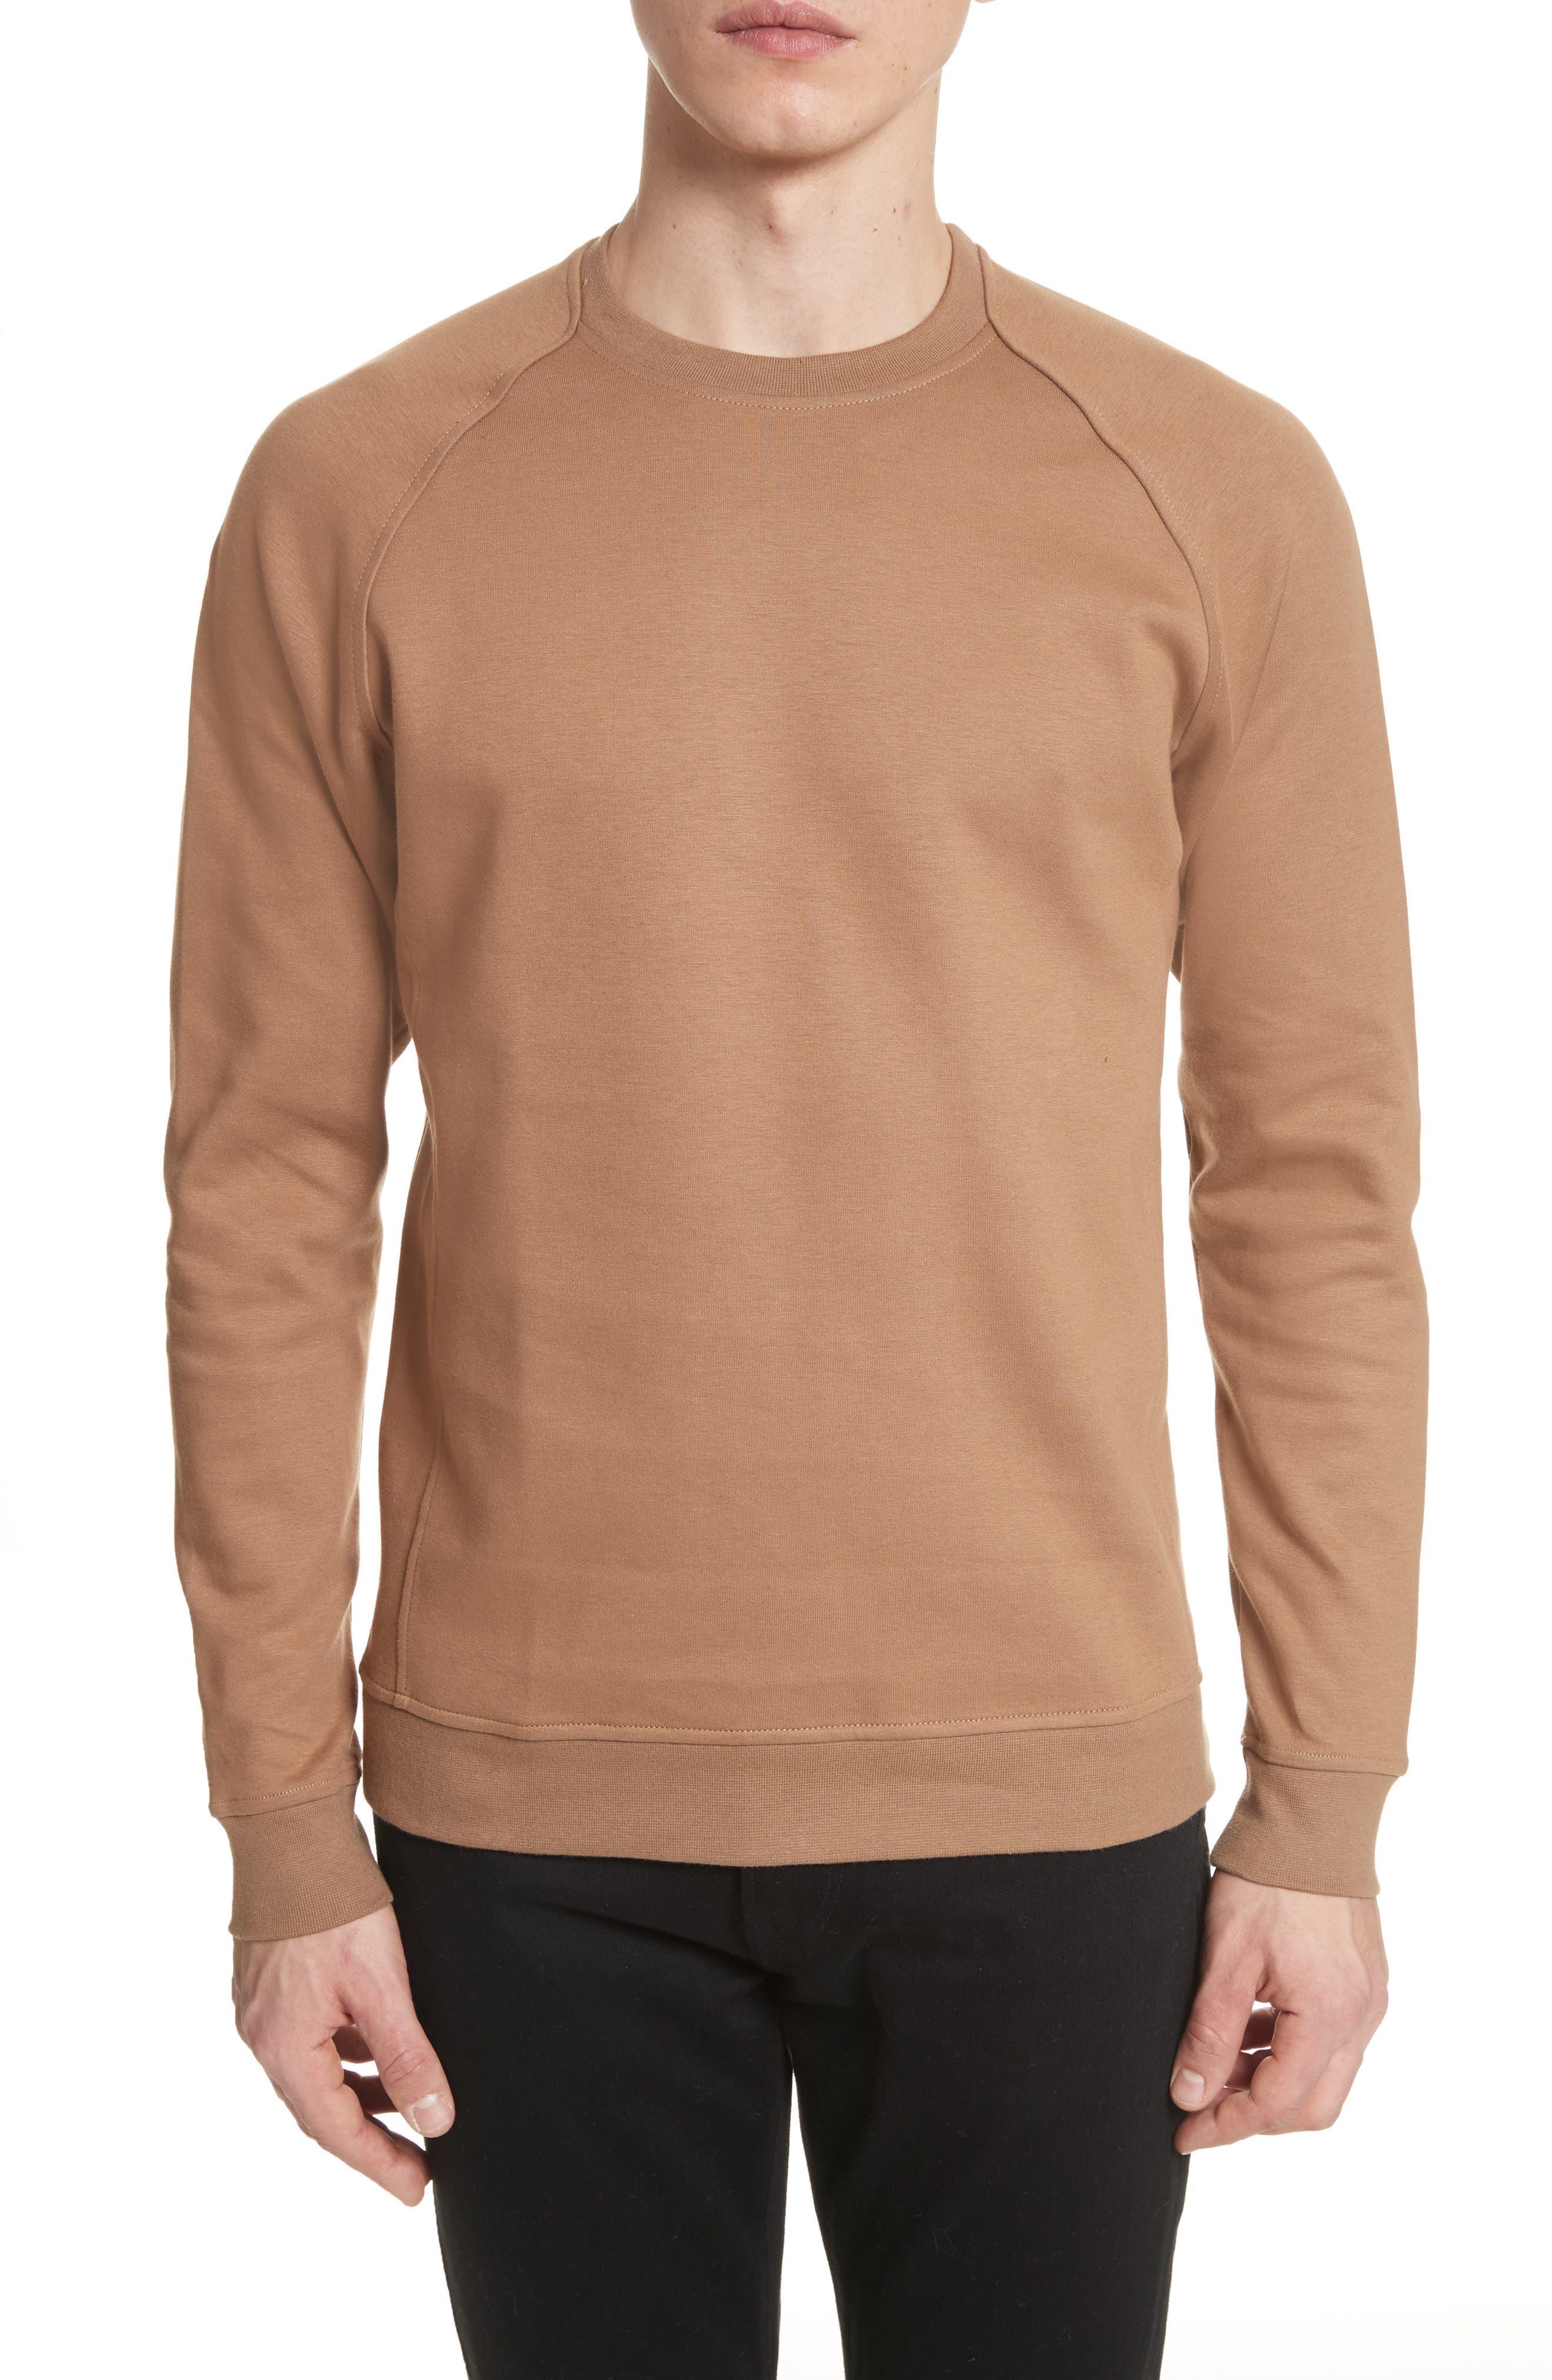 Ketel Dry Mercerized Crewneck Sweatshirt,                             Main thumbnail 1, color,                             251